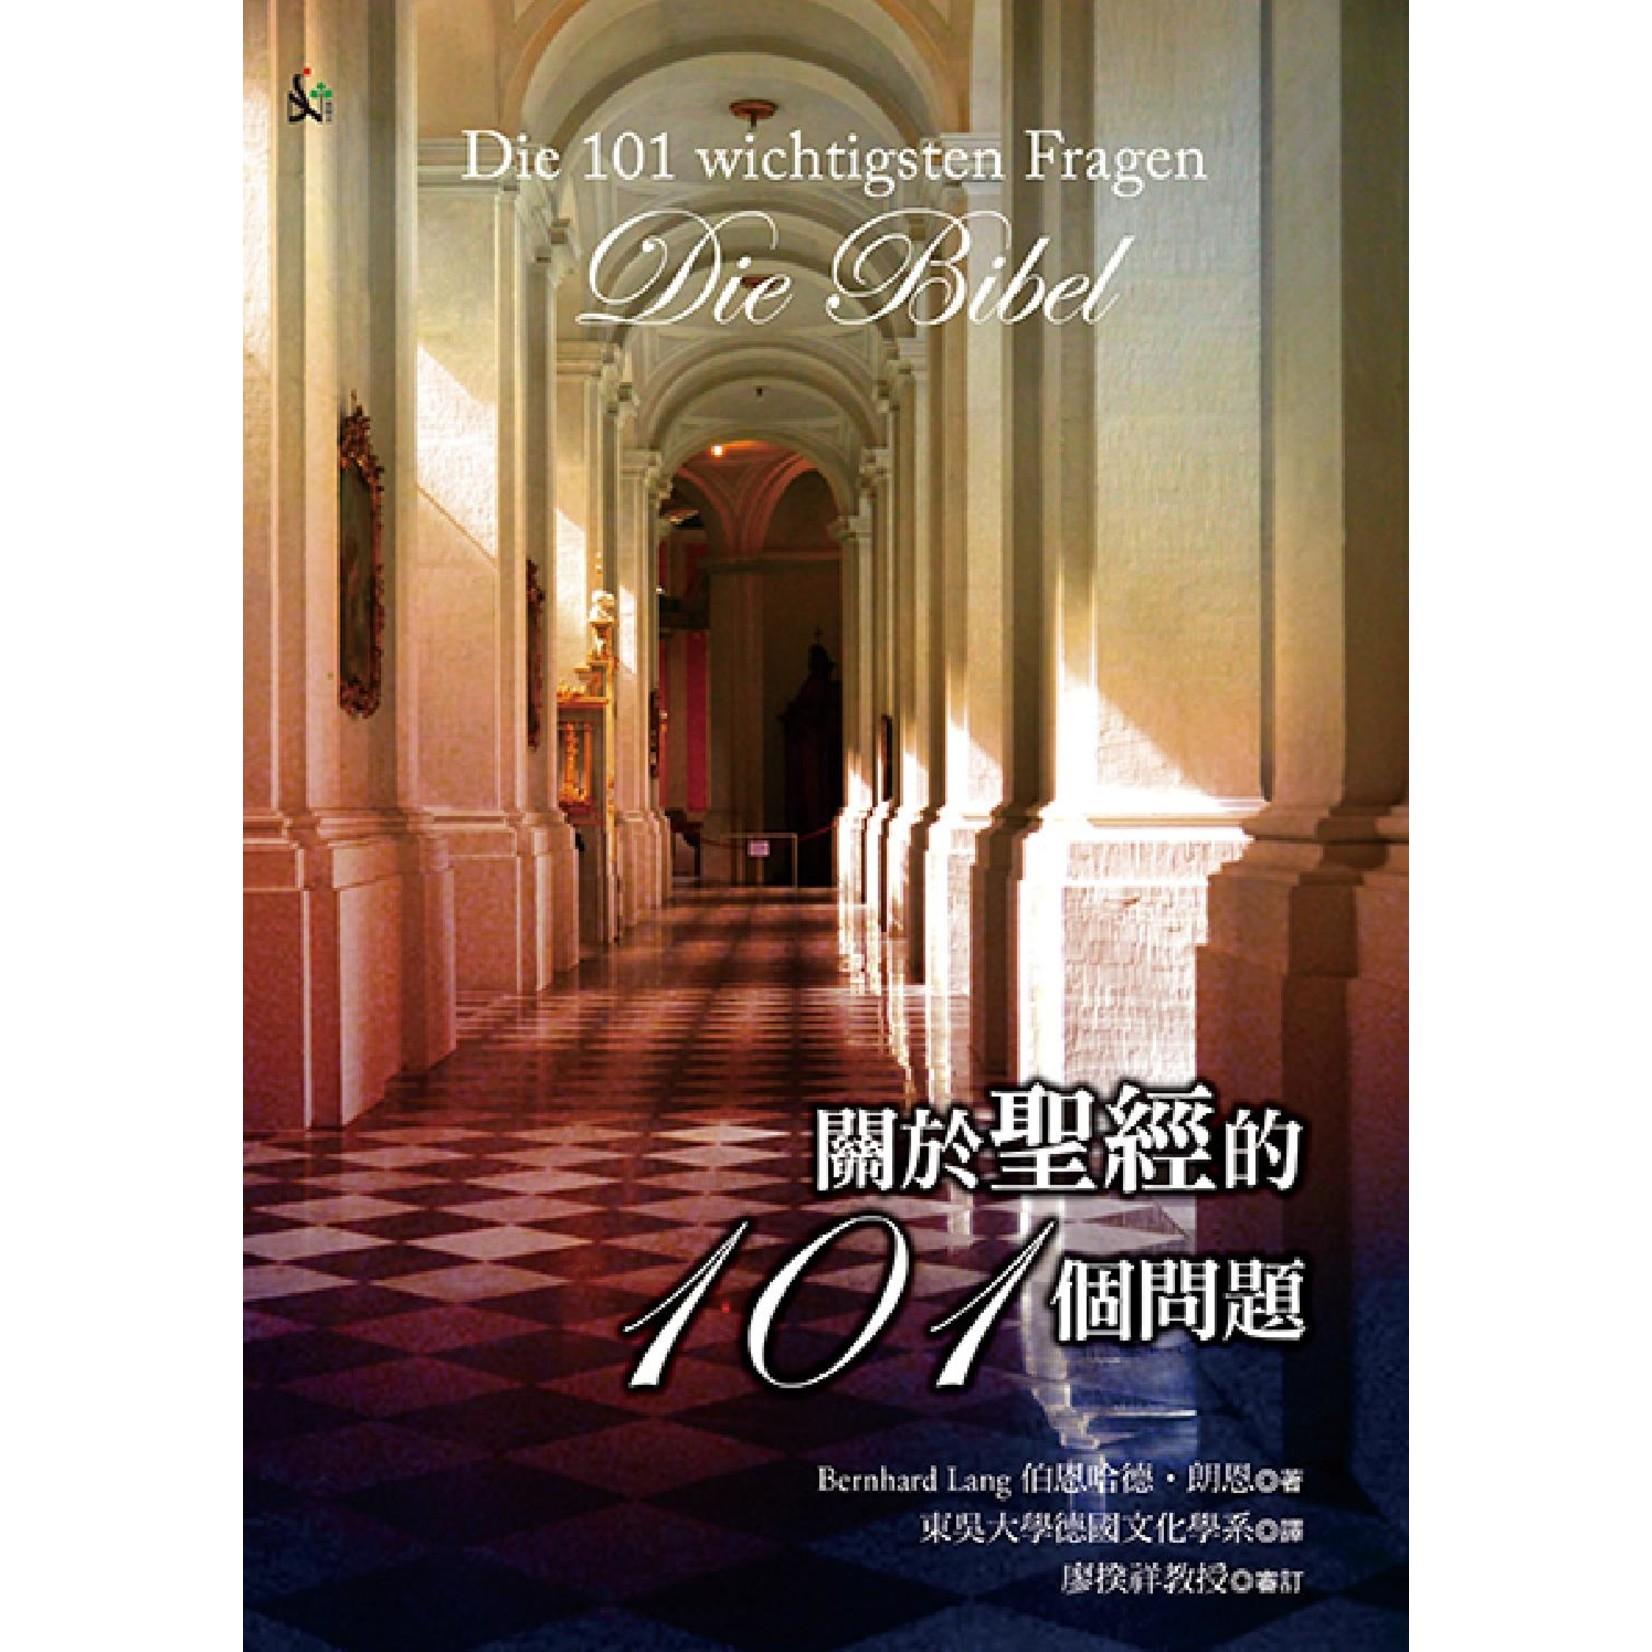 南與北文化 South & North Publishing 關於聖經的101個問題 Die 101 wichtigsten Fragen: Die Bibel